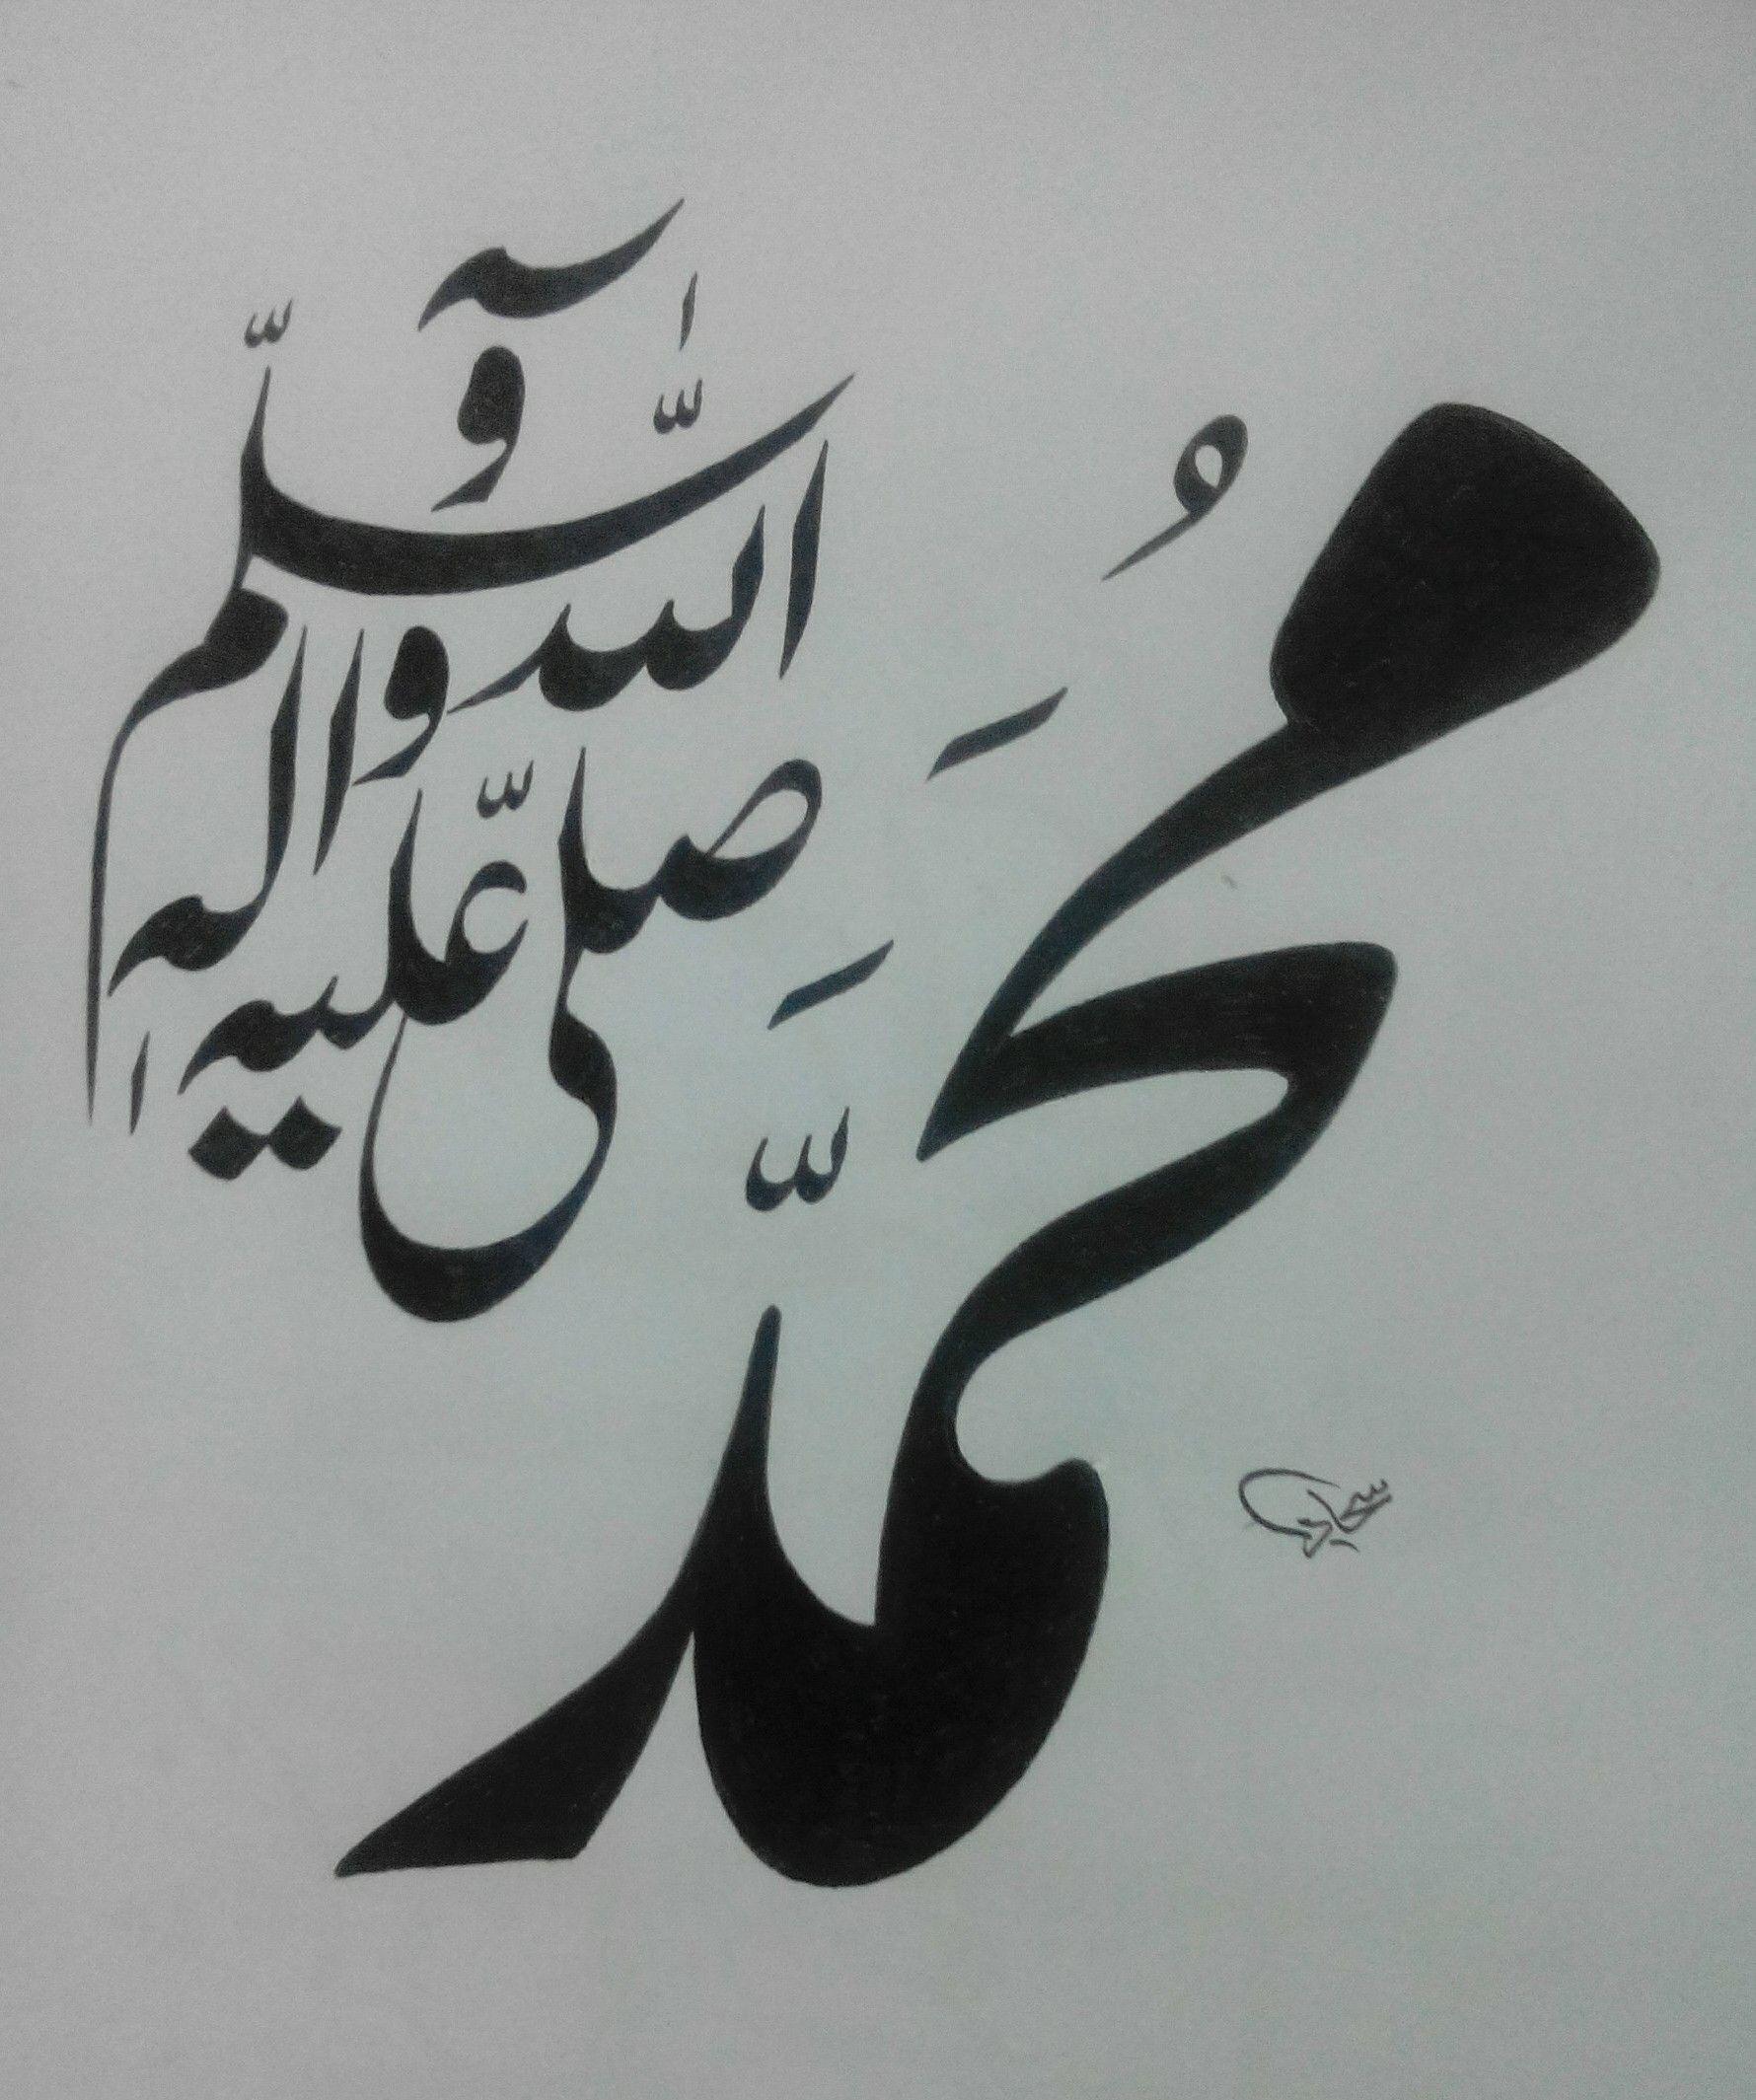 سجاد خالد Islamic Art Calligraphy Islamic Calligraphy Islamic Art